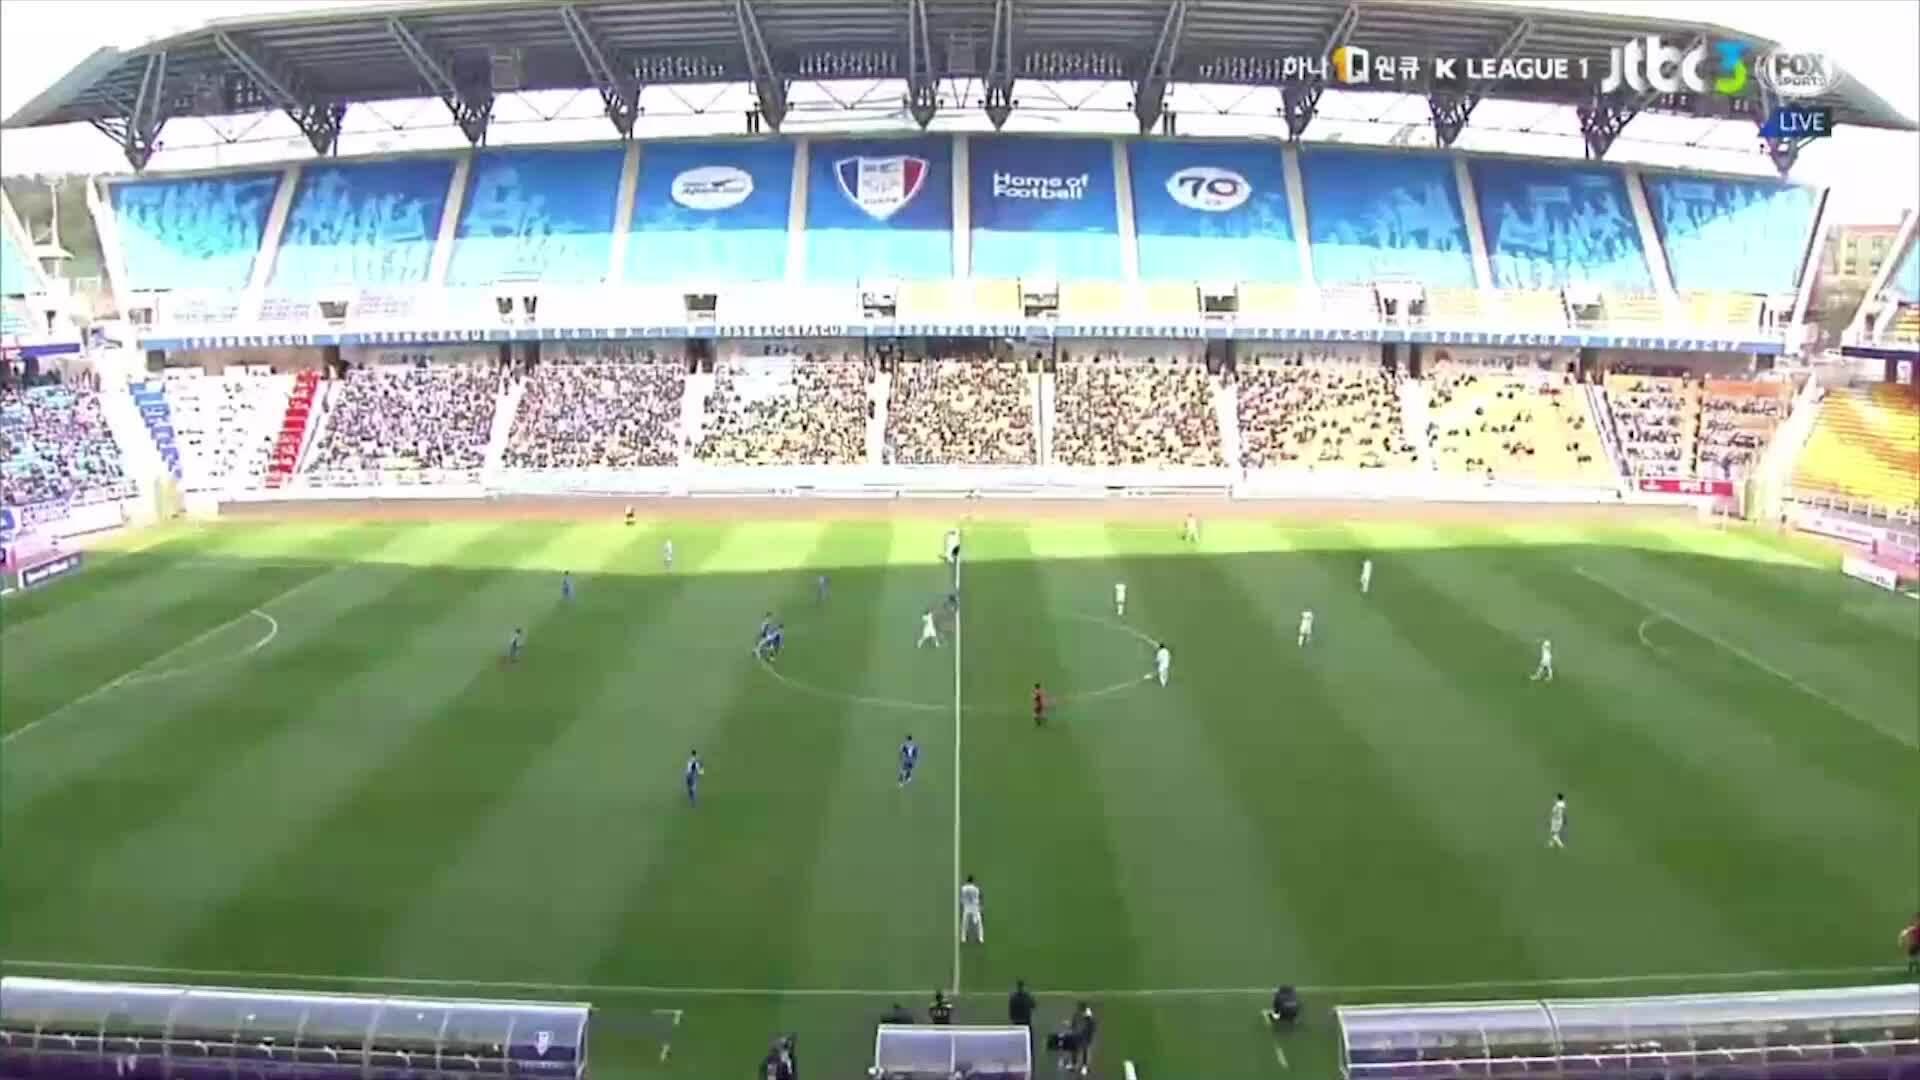 Suwon Bluewings 3-1 Incheon United